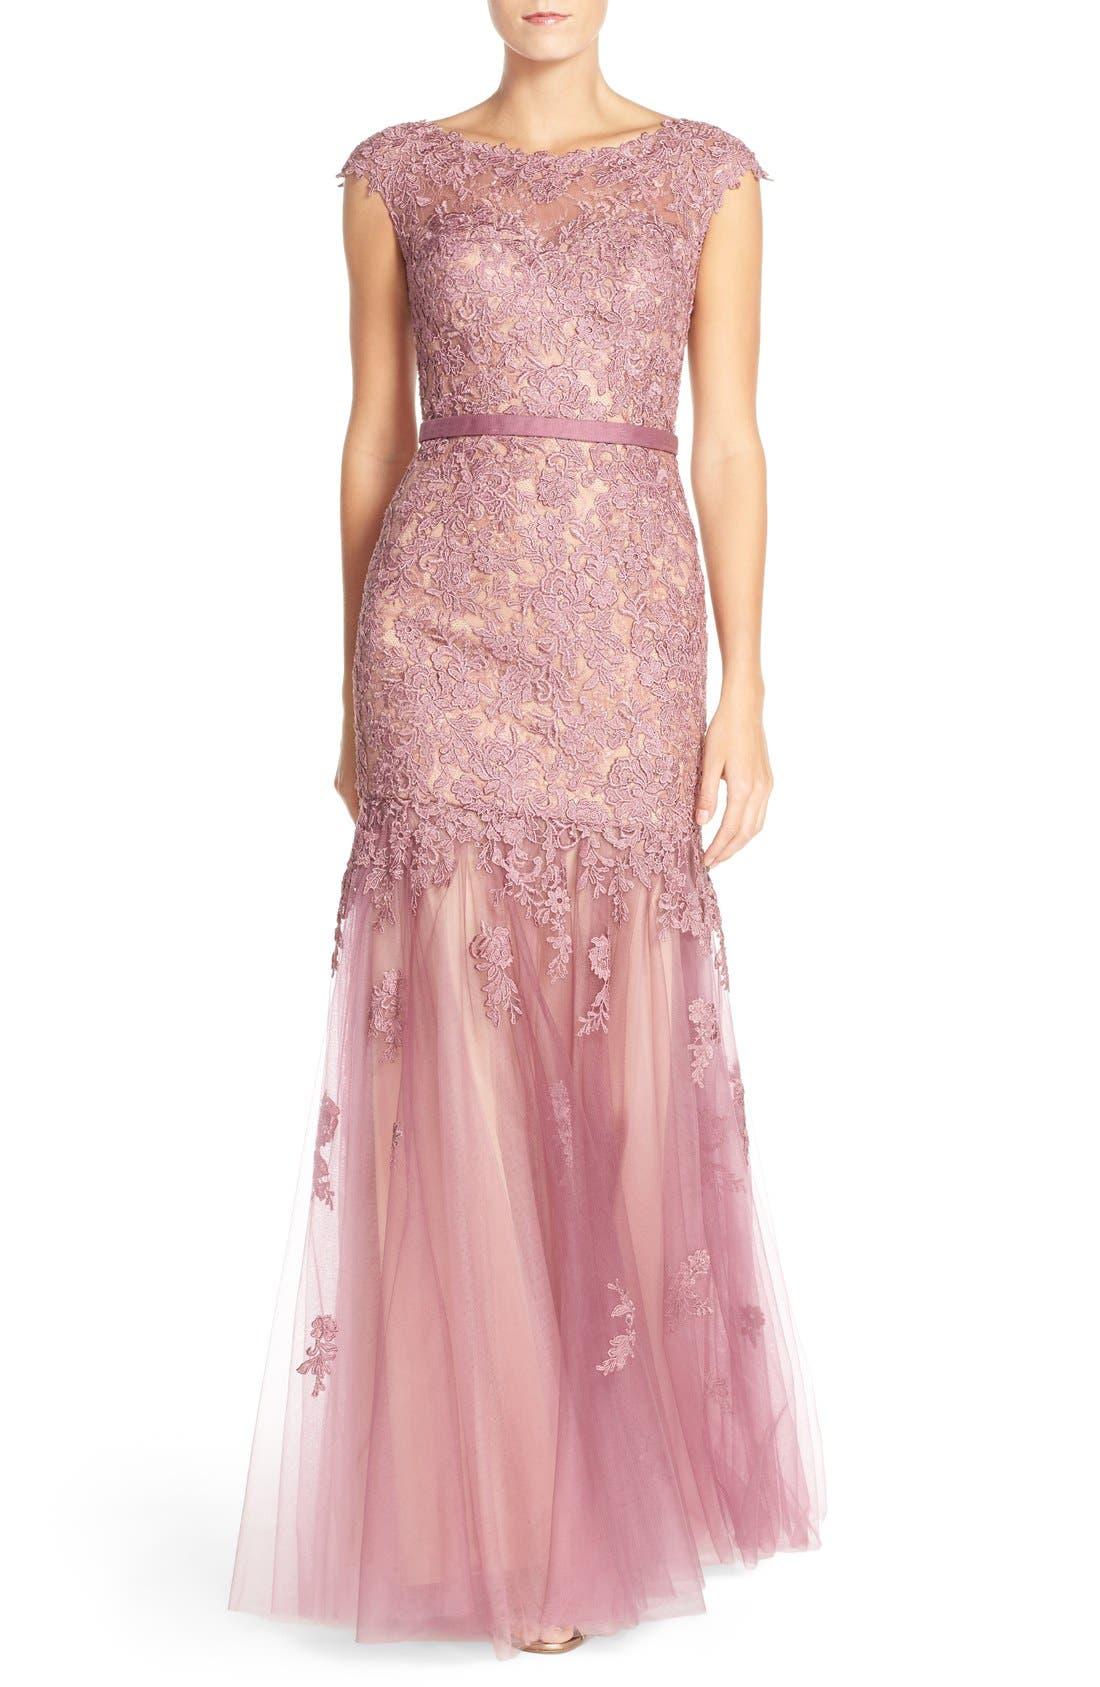 Main Image - La Femme Lace & Tulle Mermaid Gown